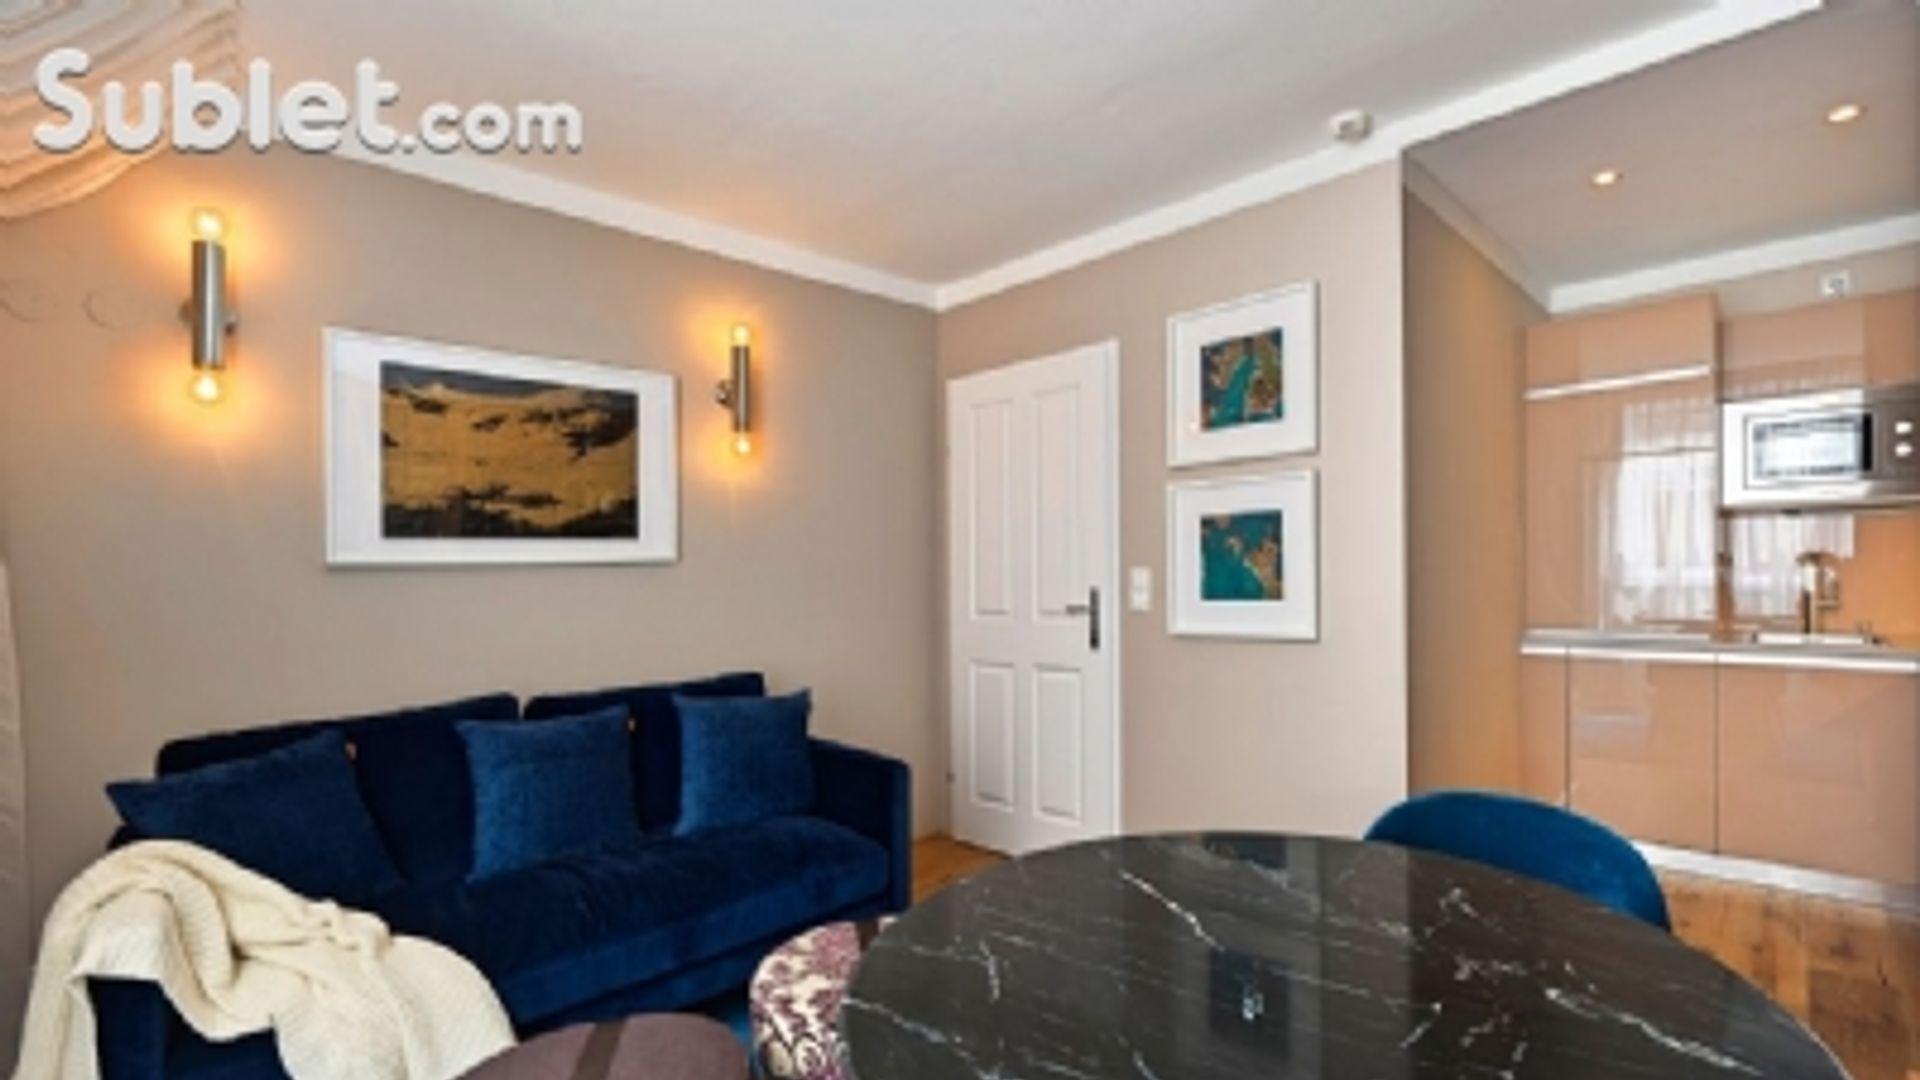 1 bed apartment at Köllnerhofgasse 5, 1010 Vienna, Austria ...